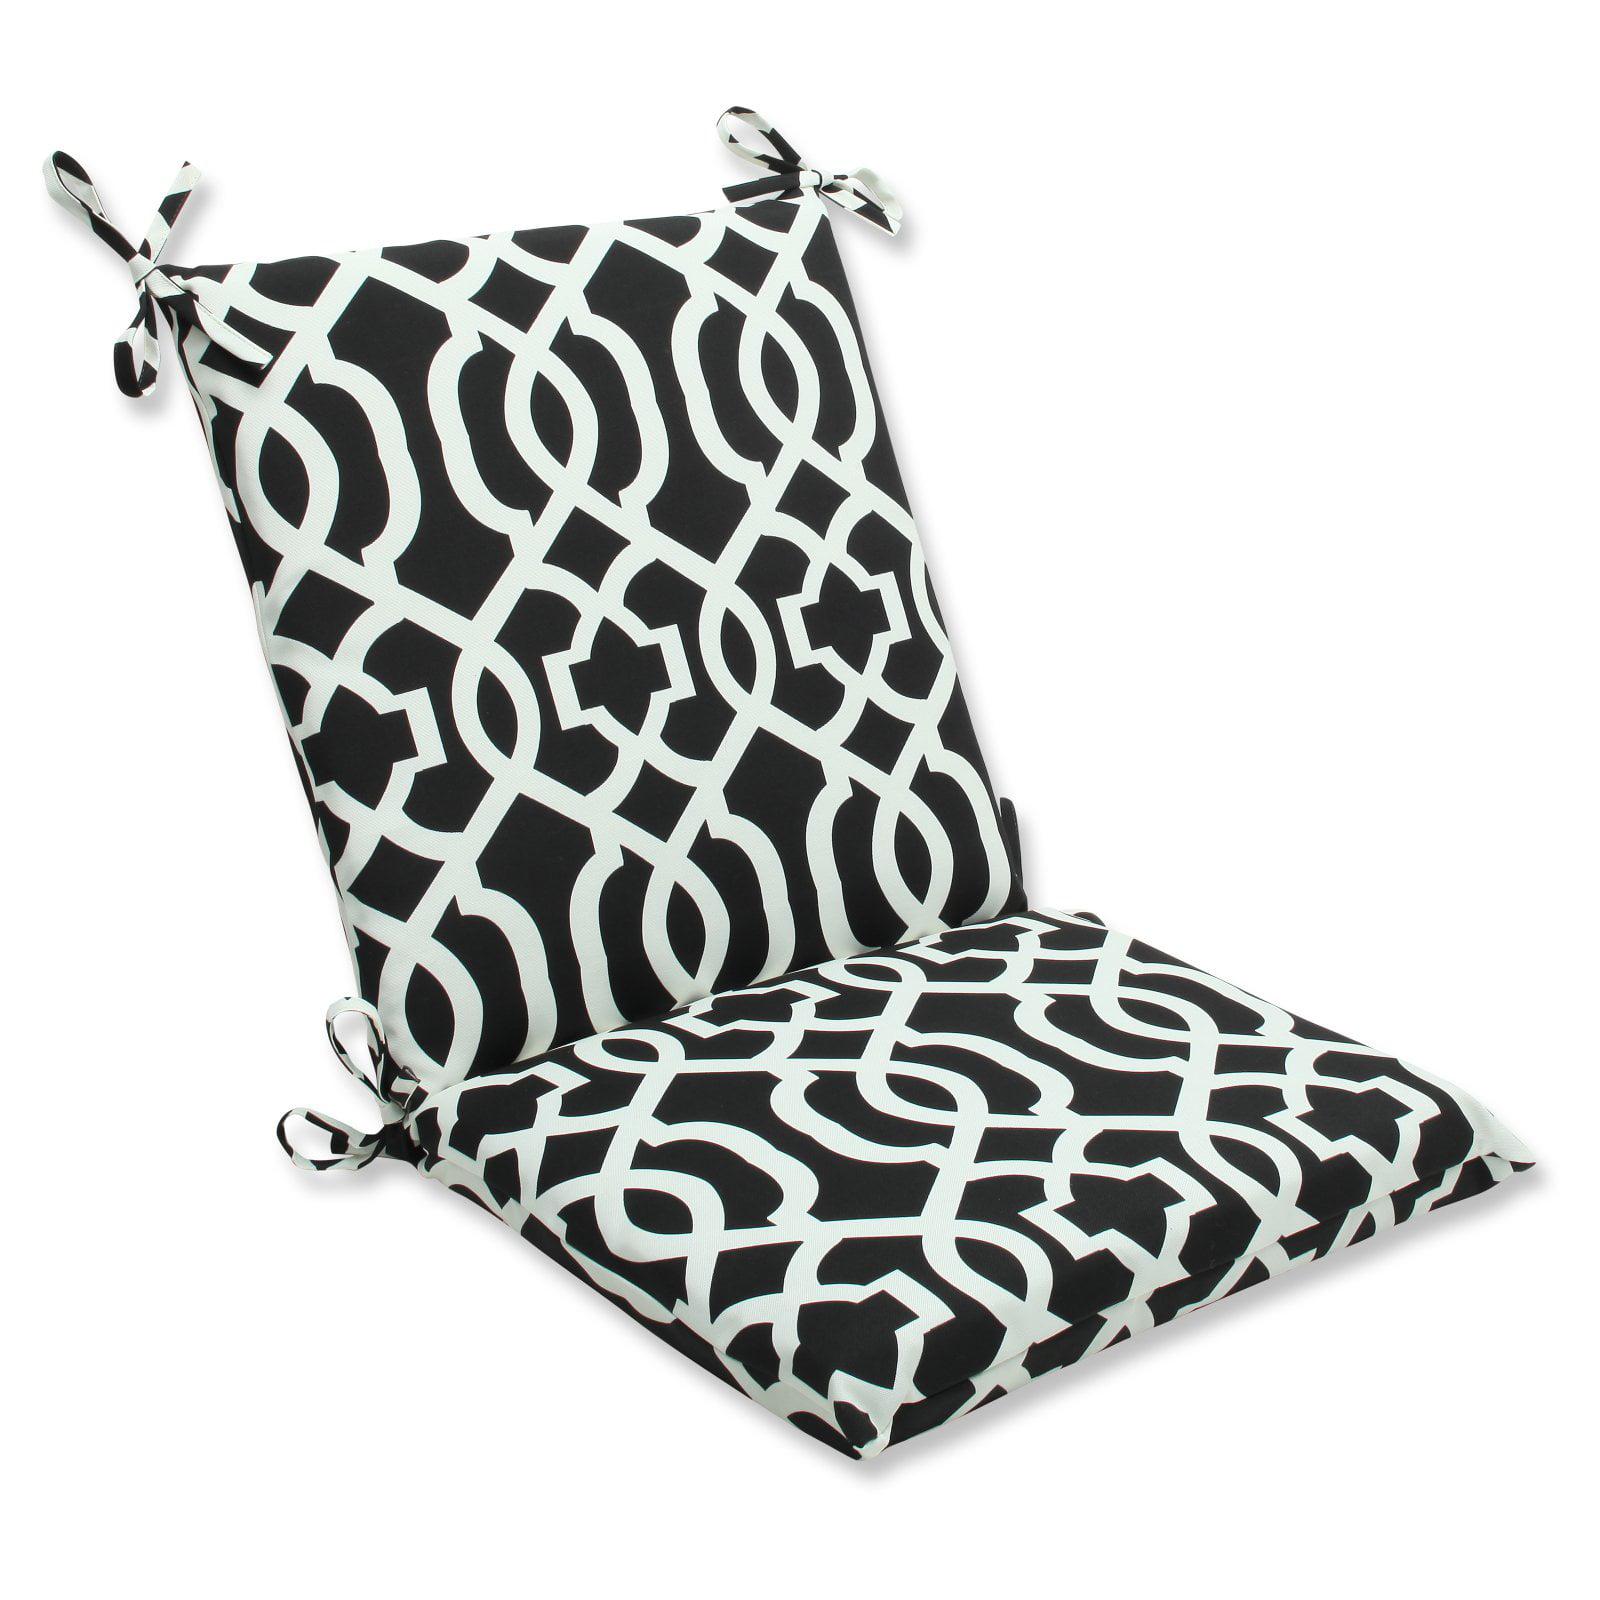 Pillow Perfect Outdoor Indoor New Geo Black White Squared Corners Chair Cushion Walmart Com Walmart Com